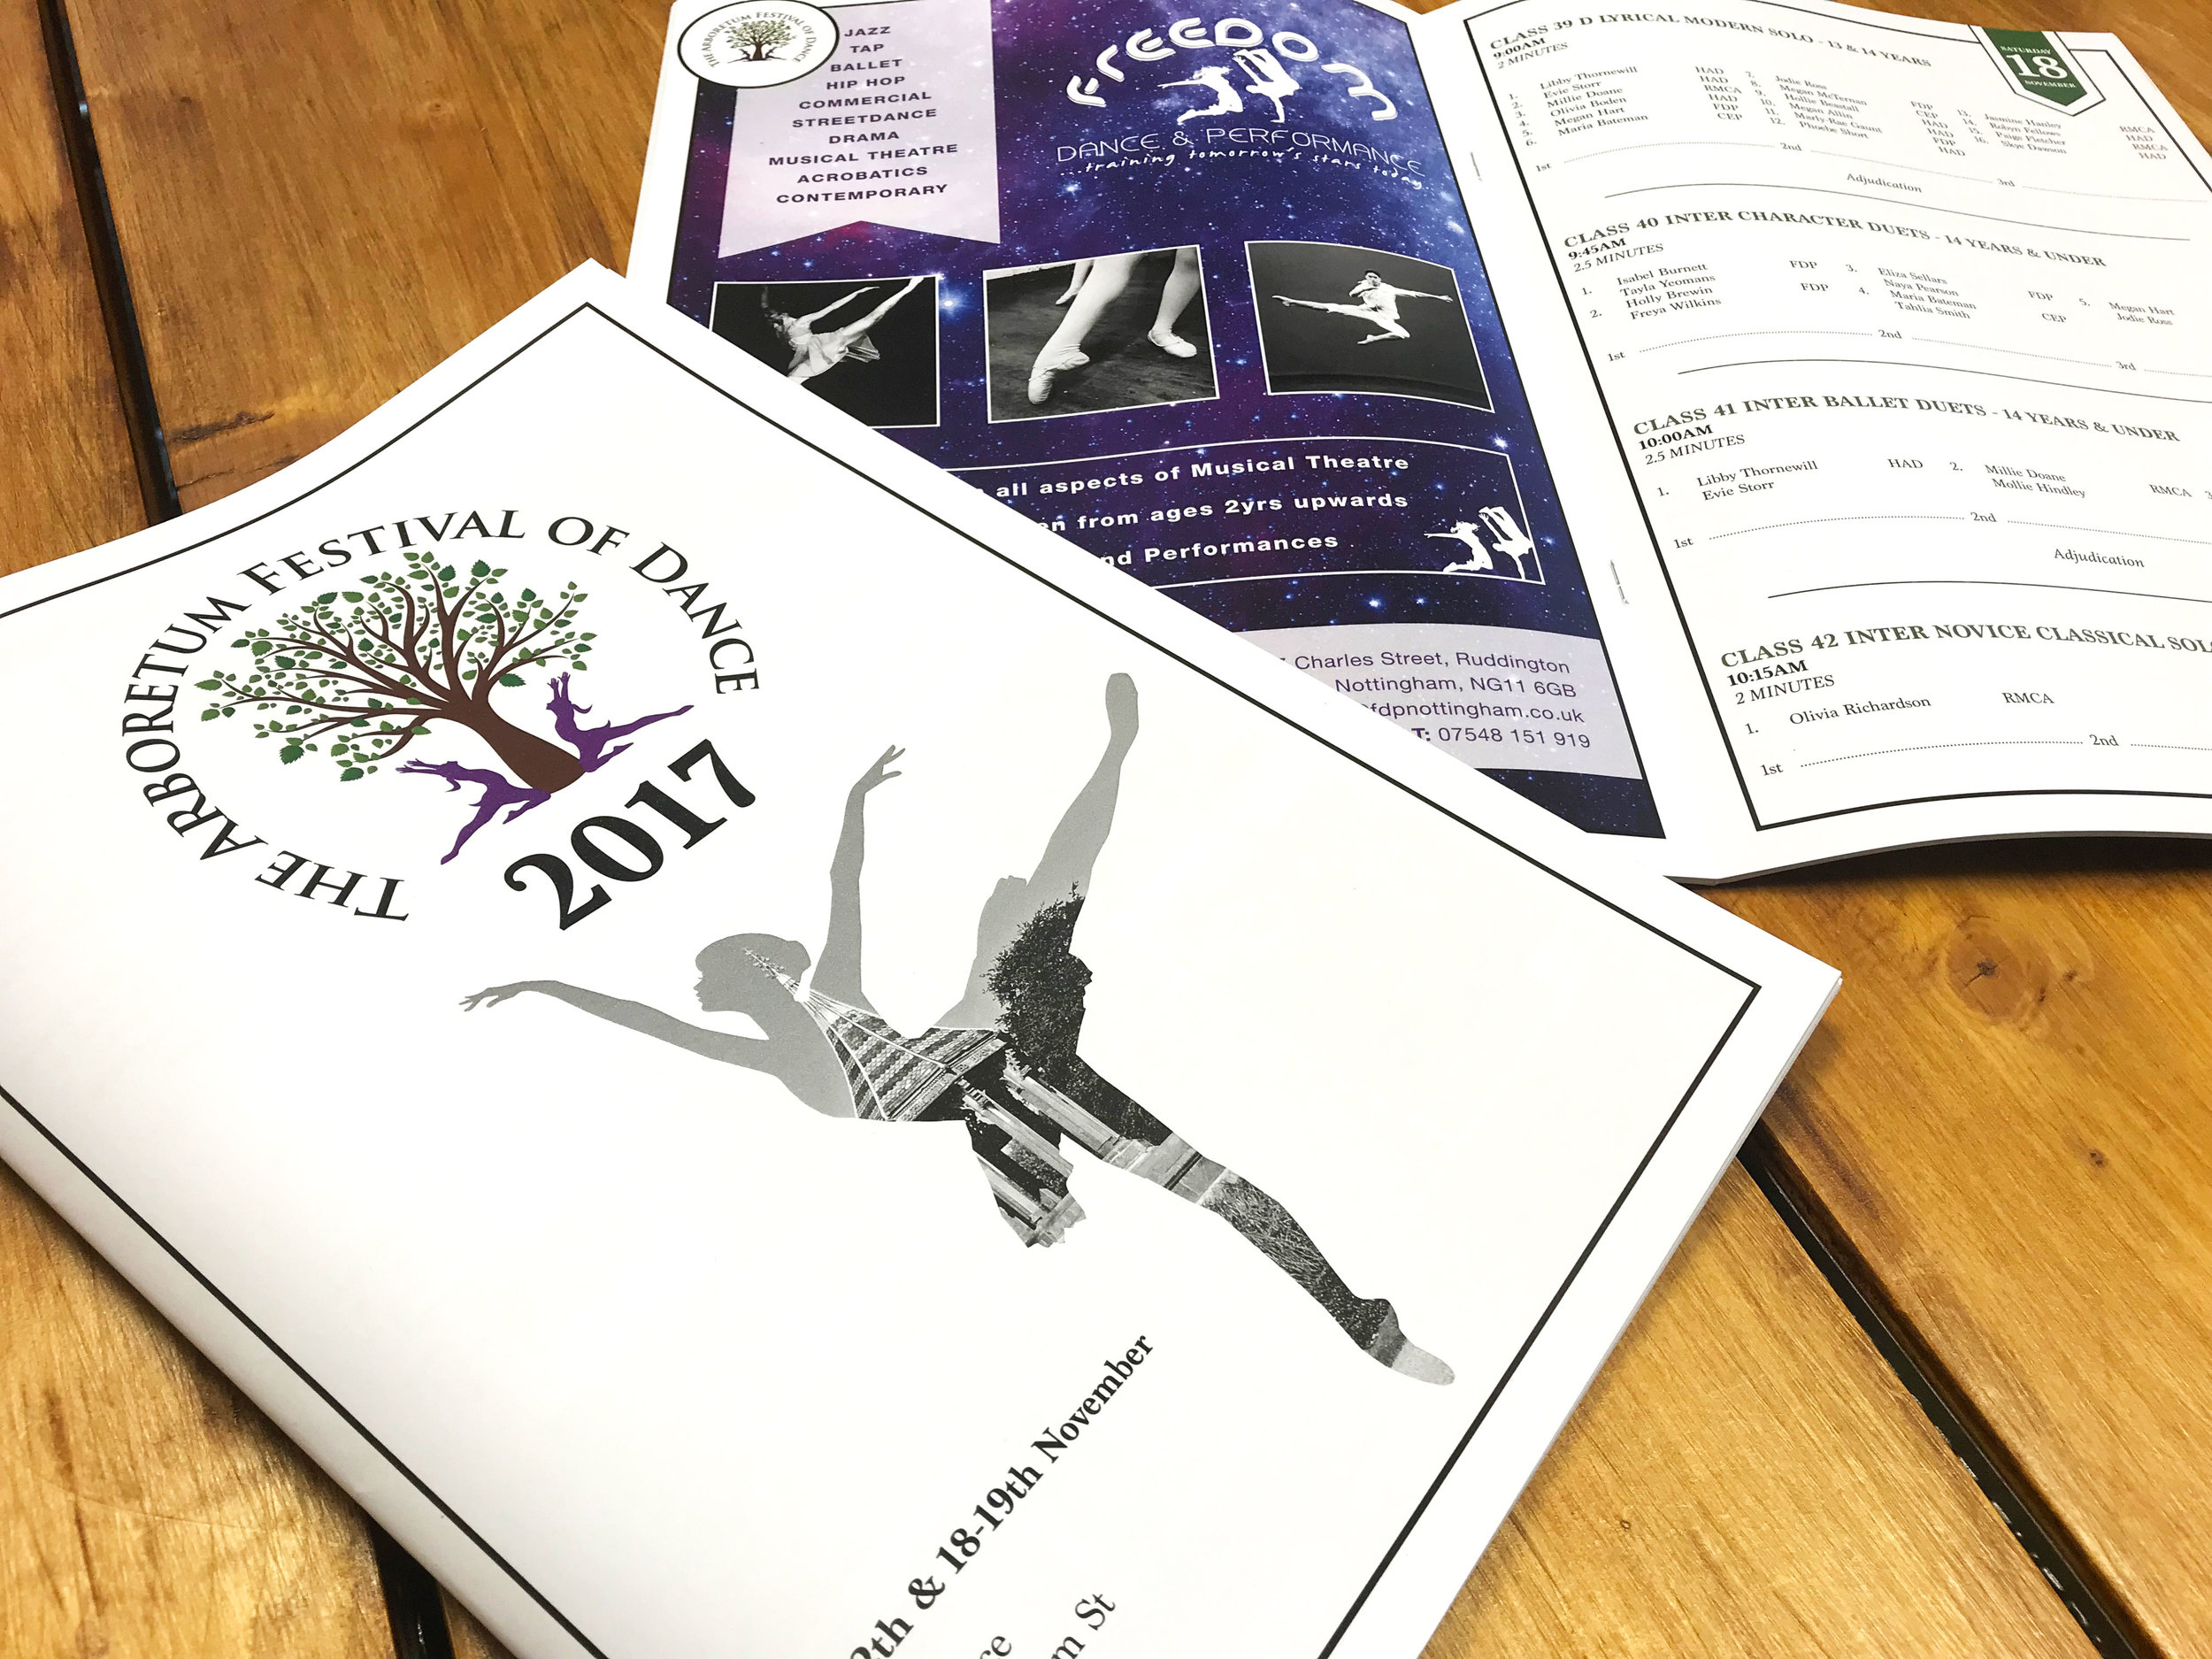 Printed Dance Festival Programme & Certificates